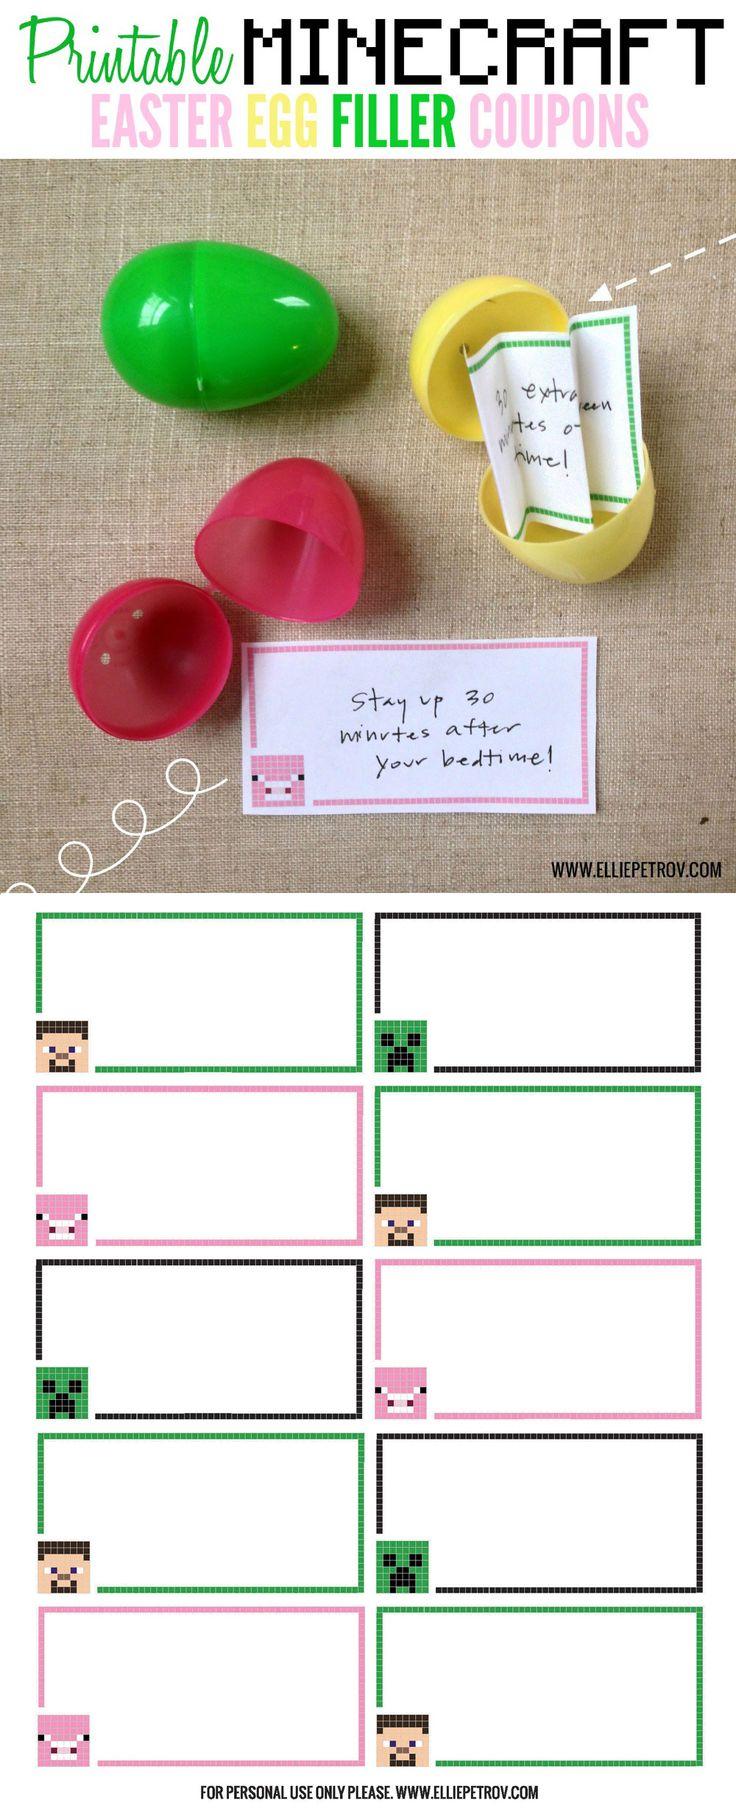 Printable Minecraft Easter Egg Filler Coupons